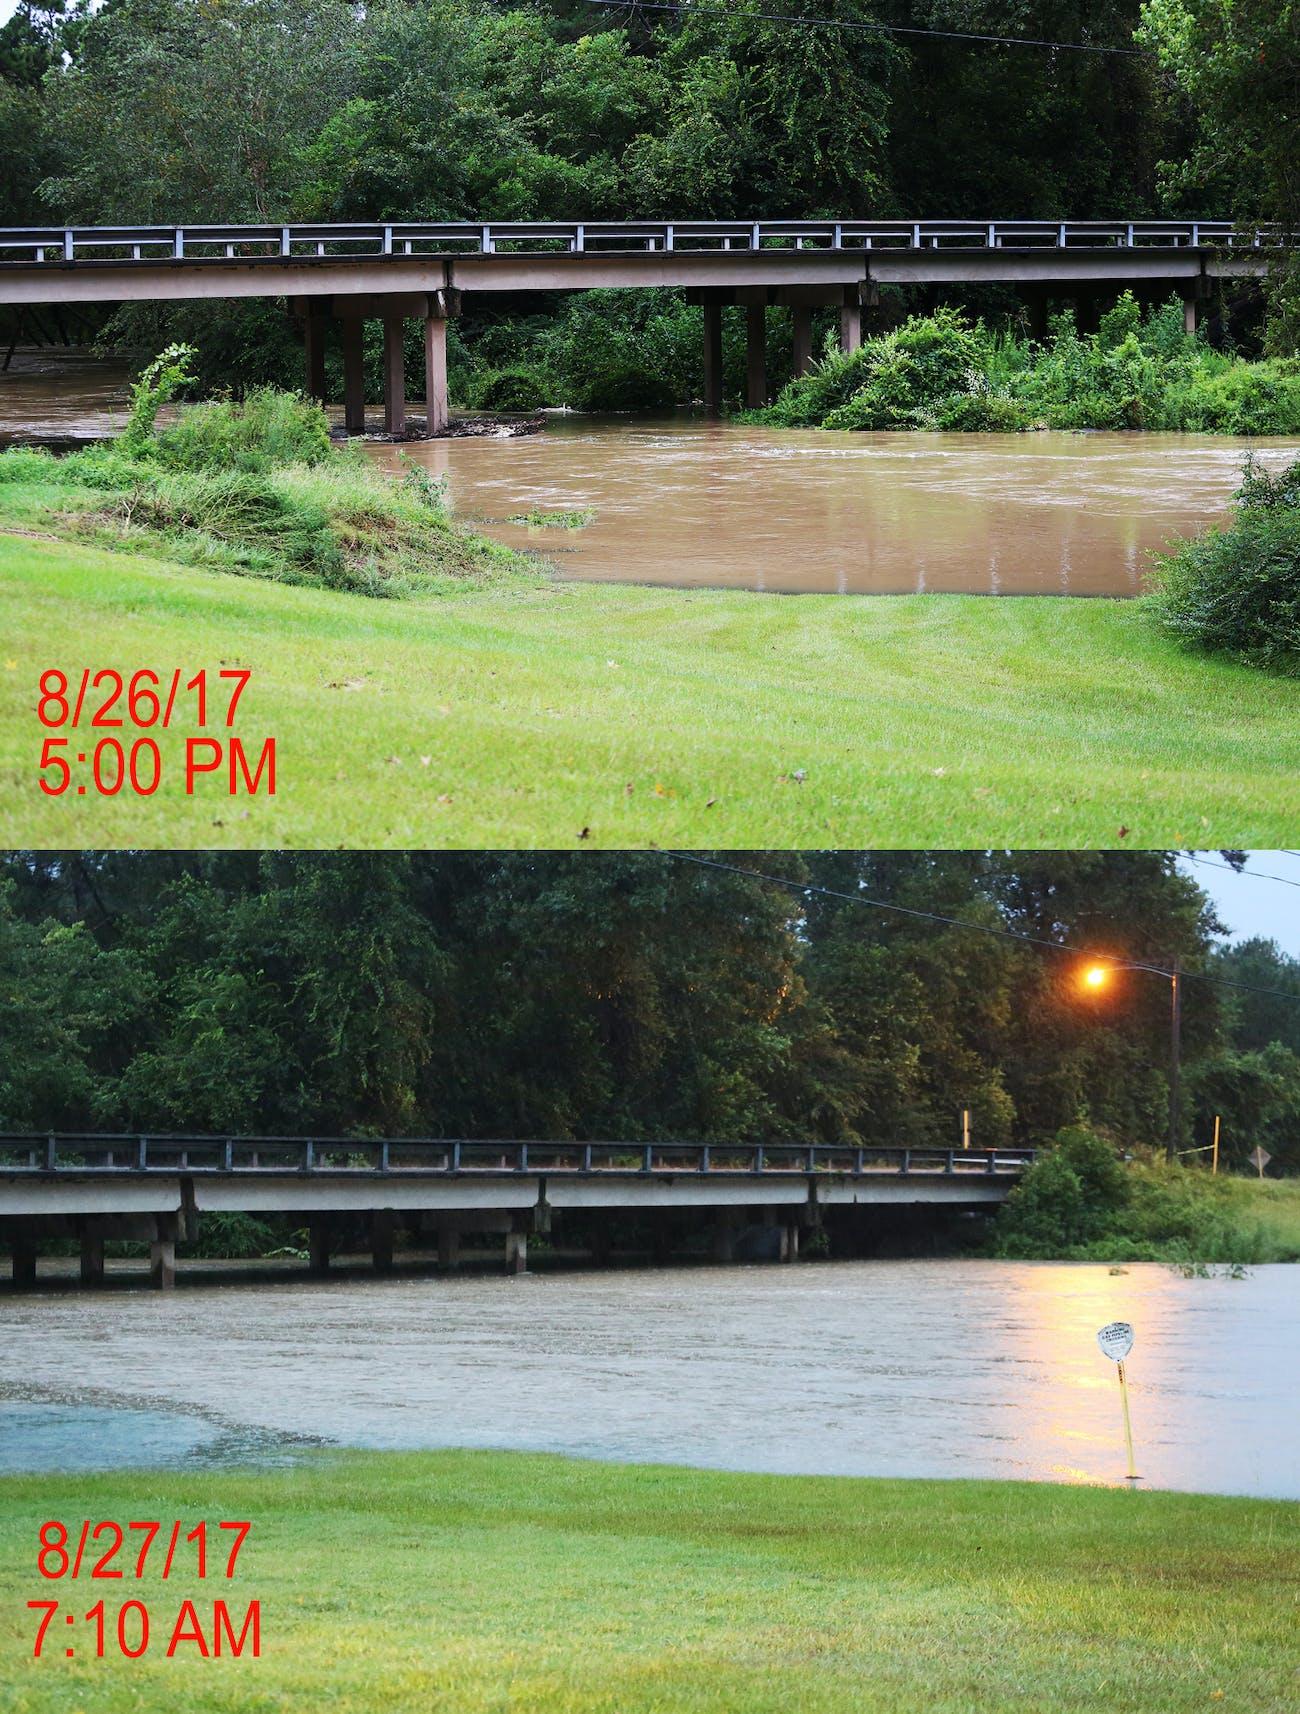 Hurricane Harvey Flood - 8/26/17 through ?